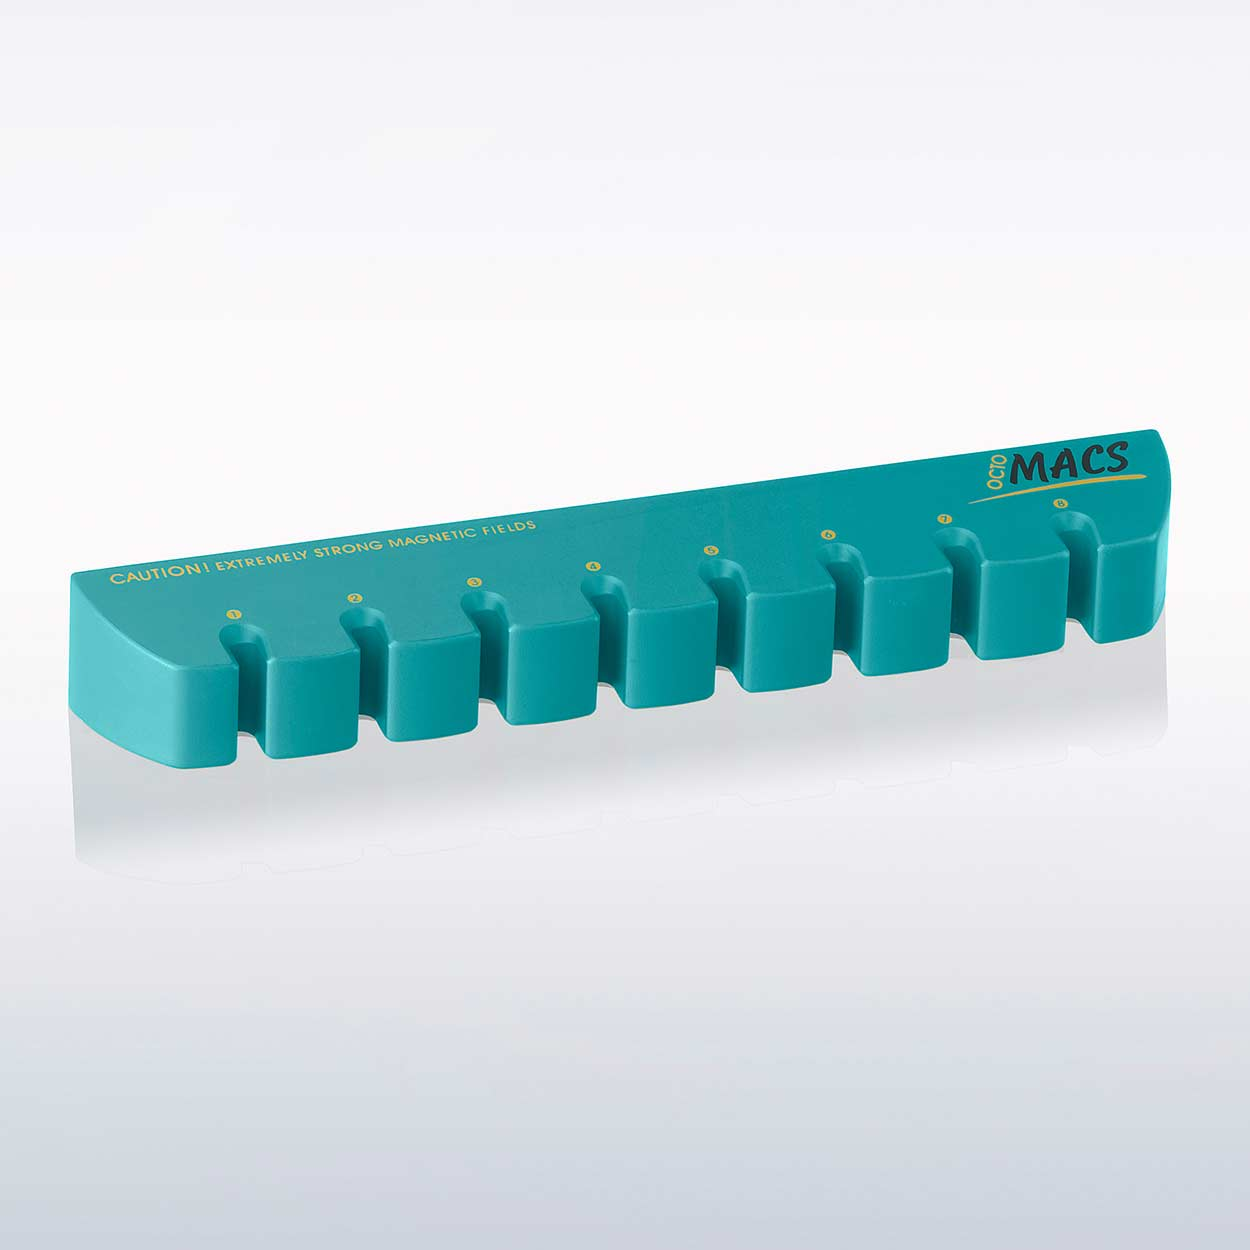 OctoMACS™ Separator and Starting Kits